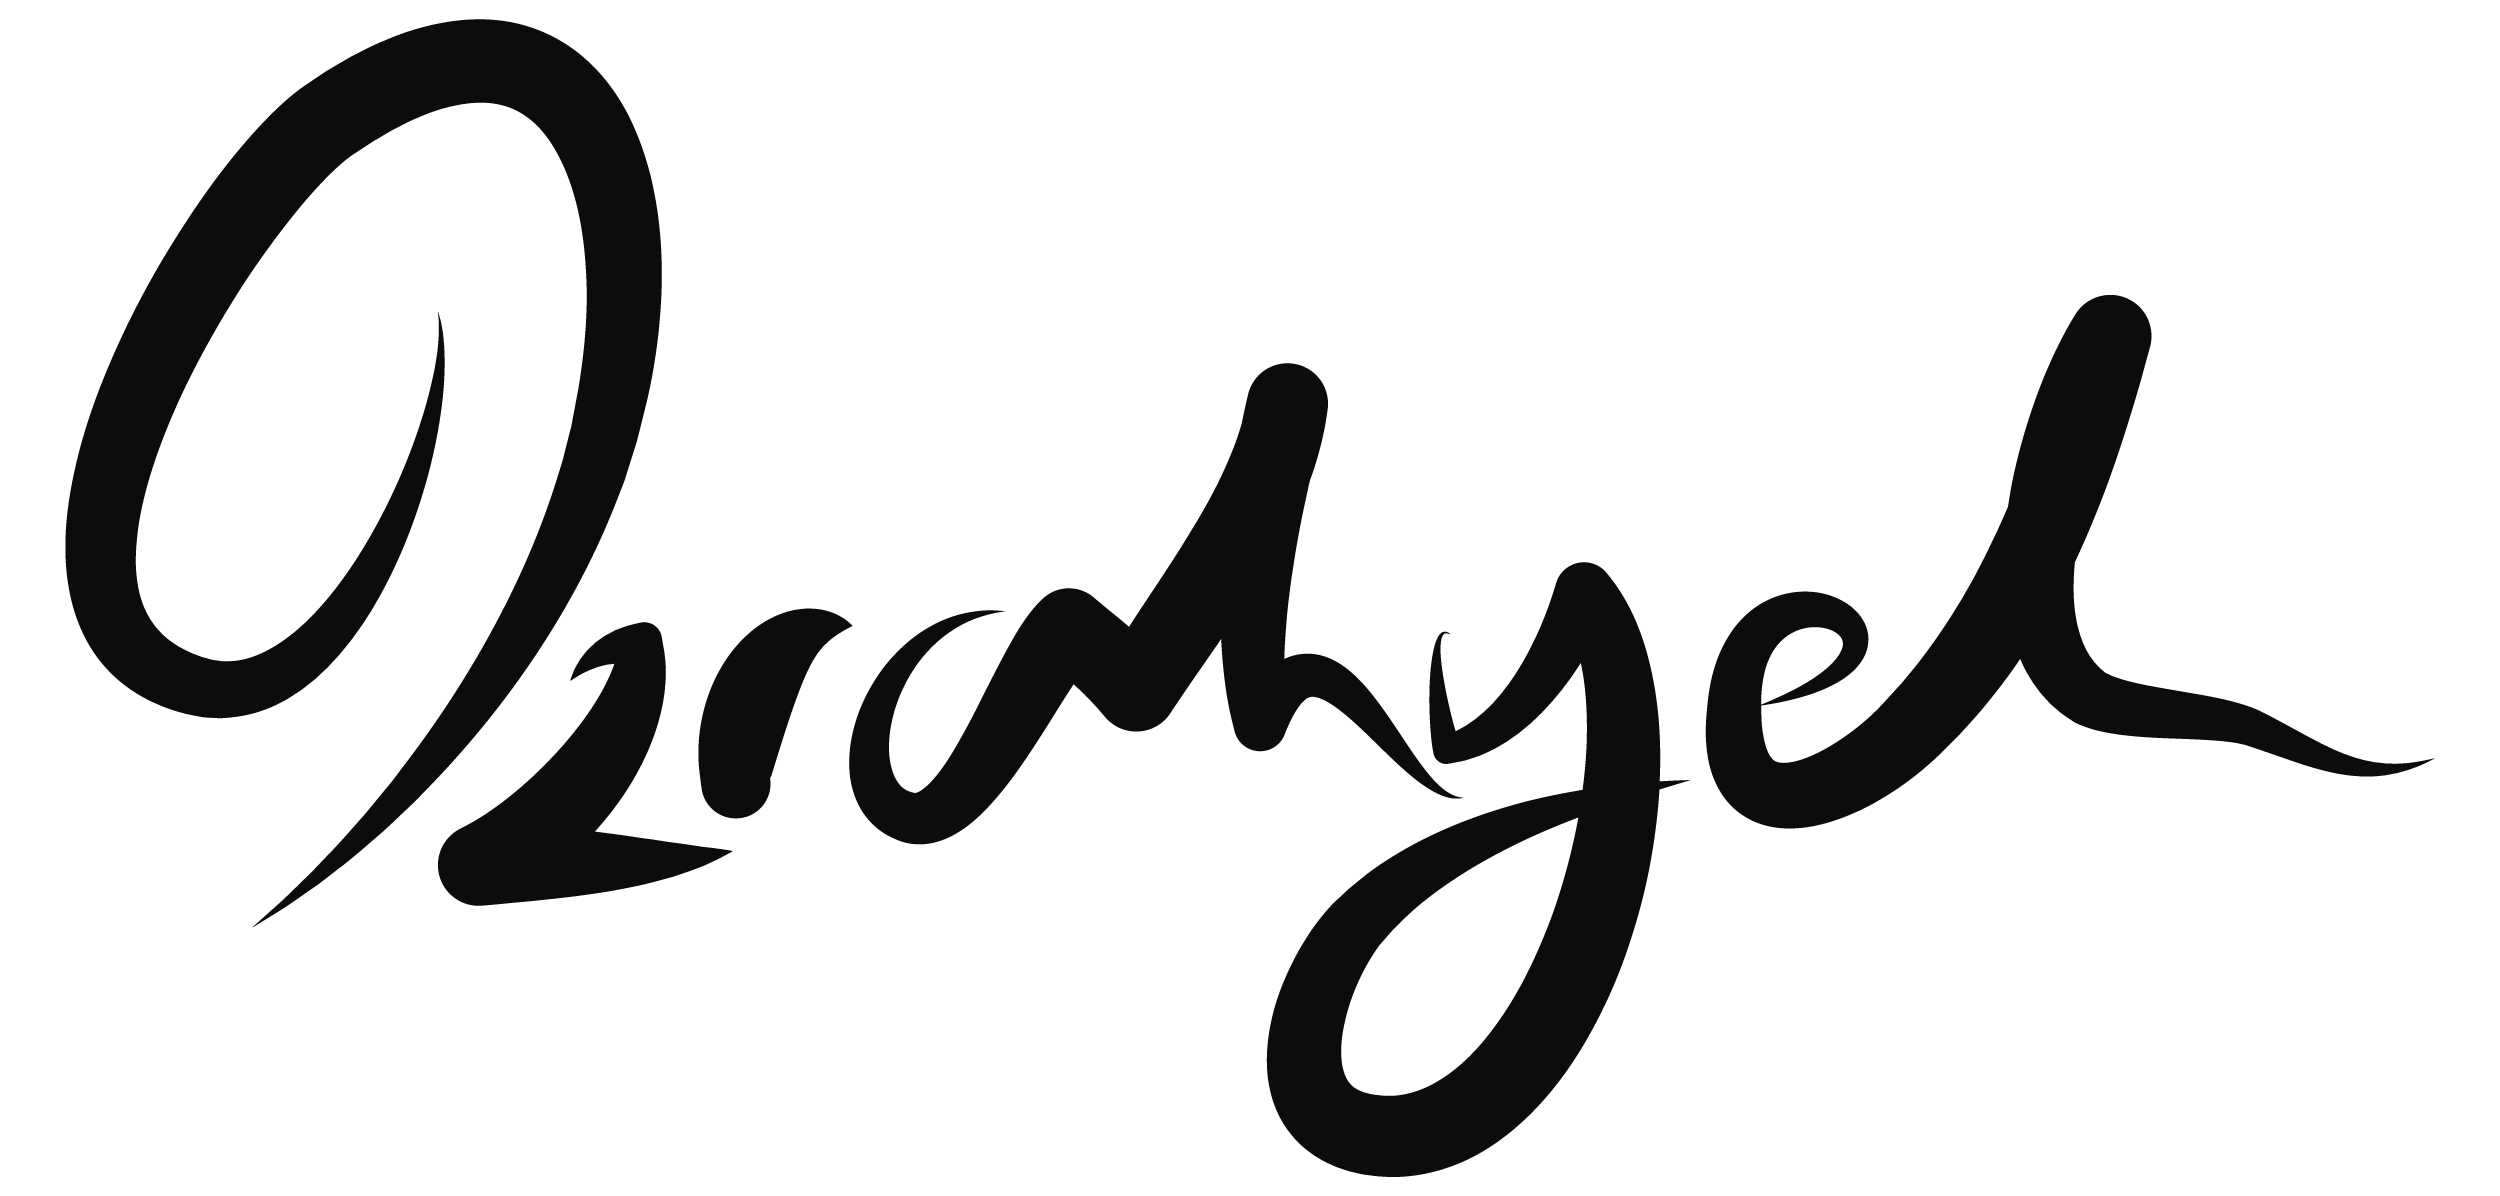 Izrahyel's Signature